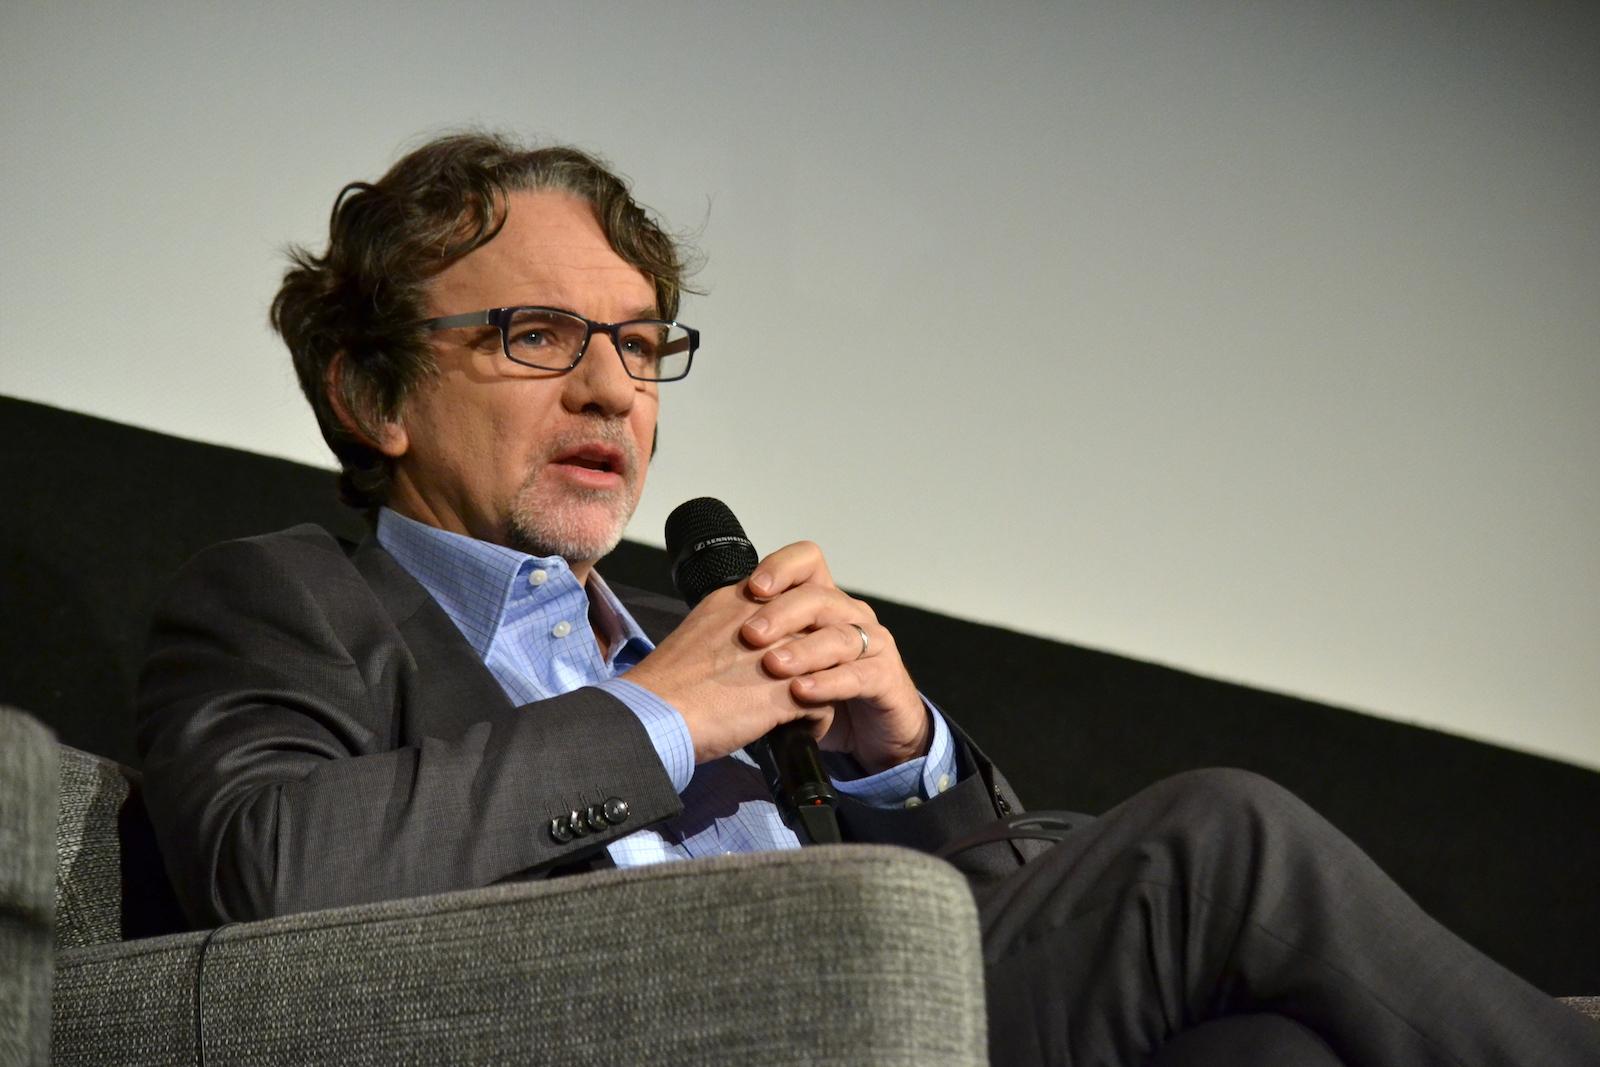 Roma Fiction Fest 2015: Frank Spotnitz durante la masterclass